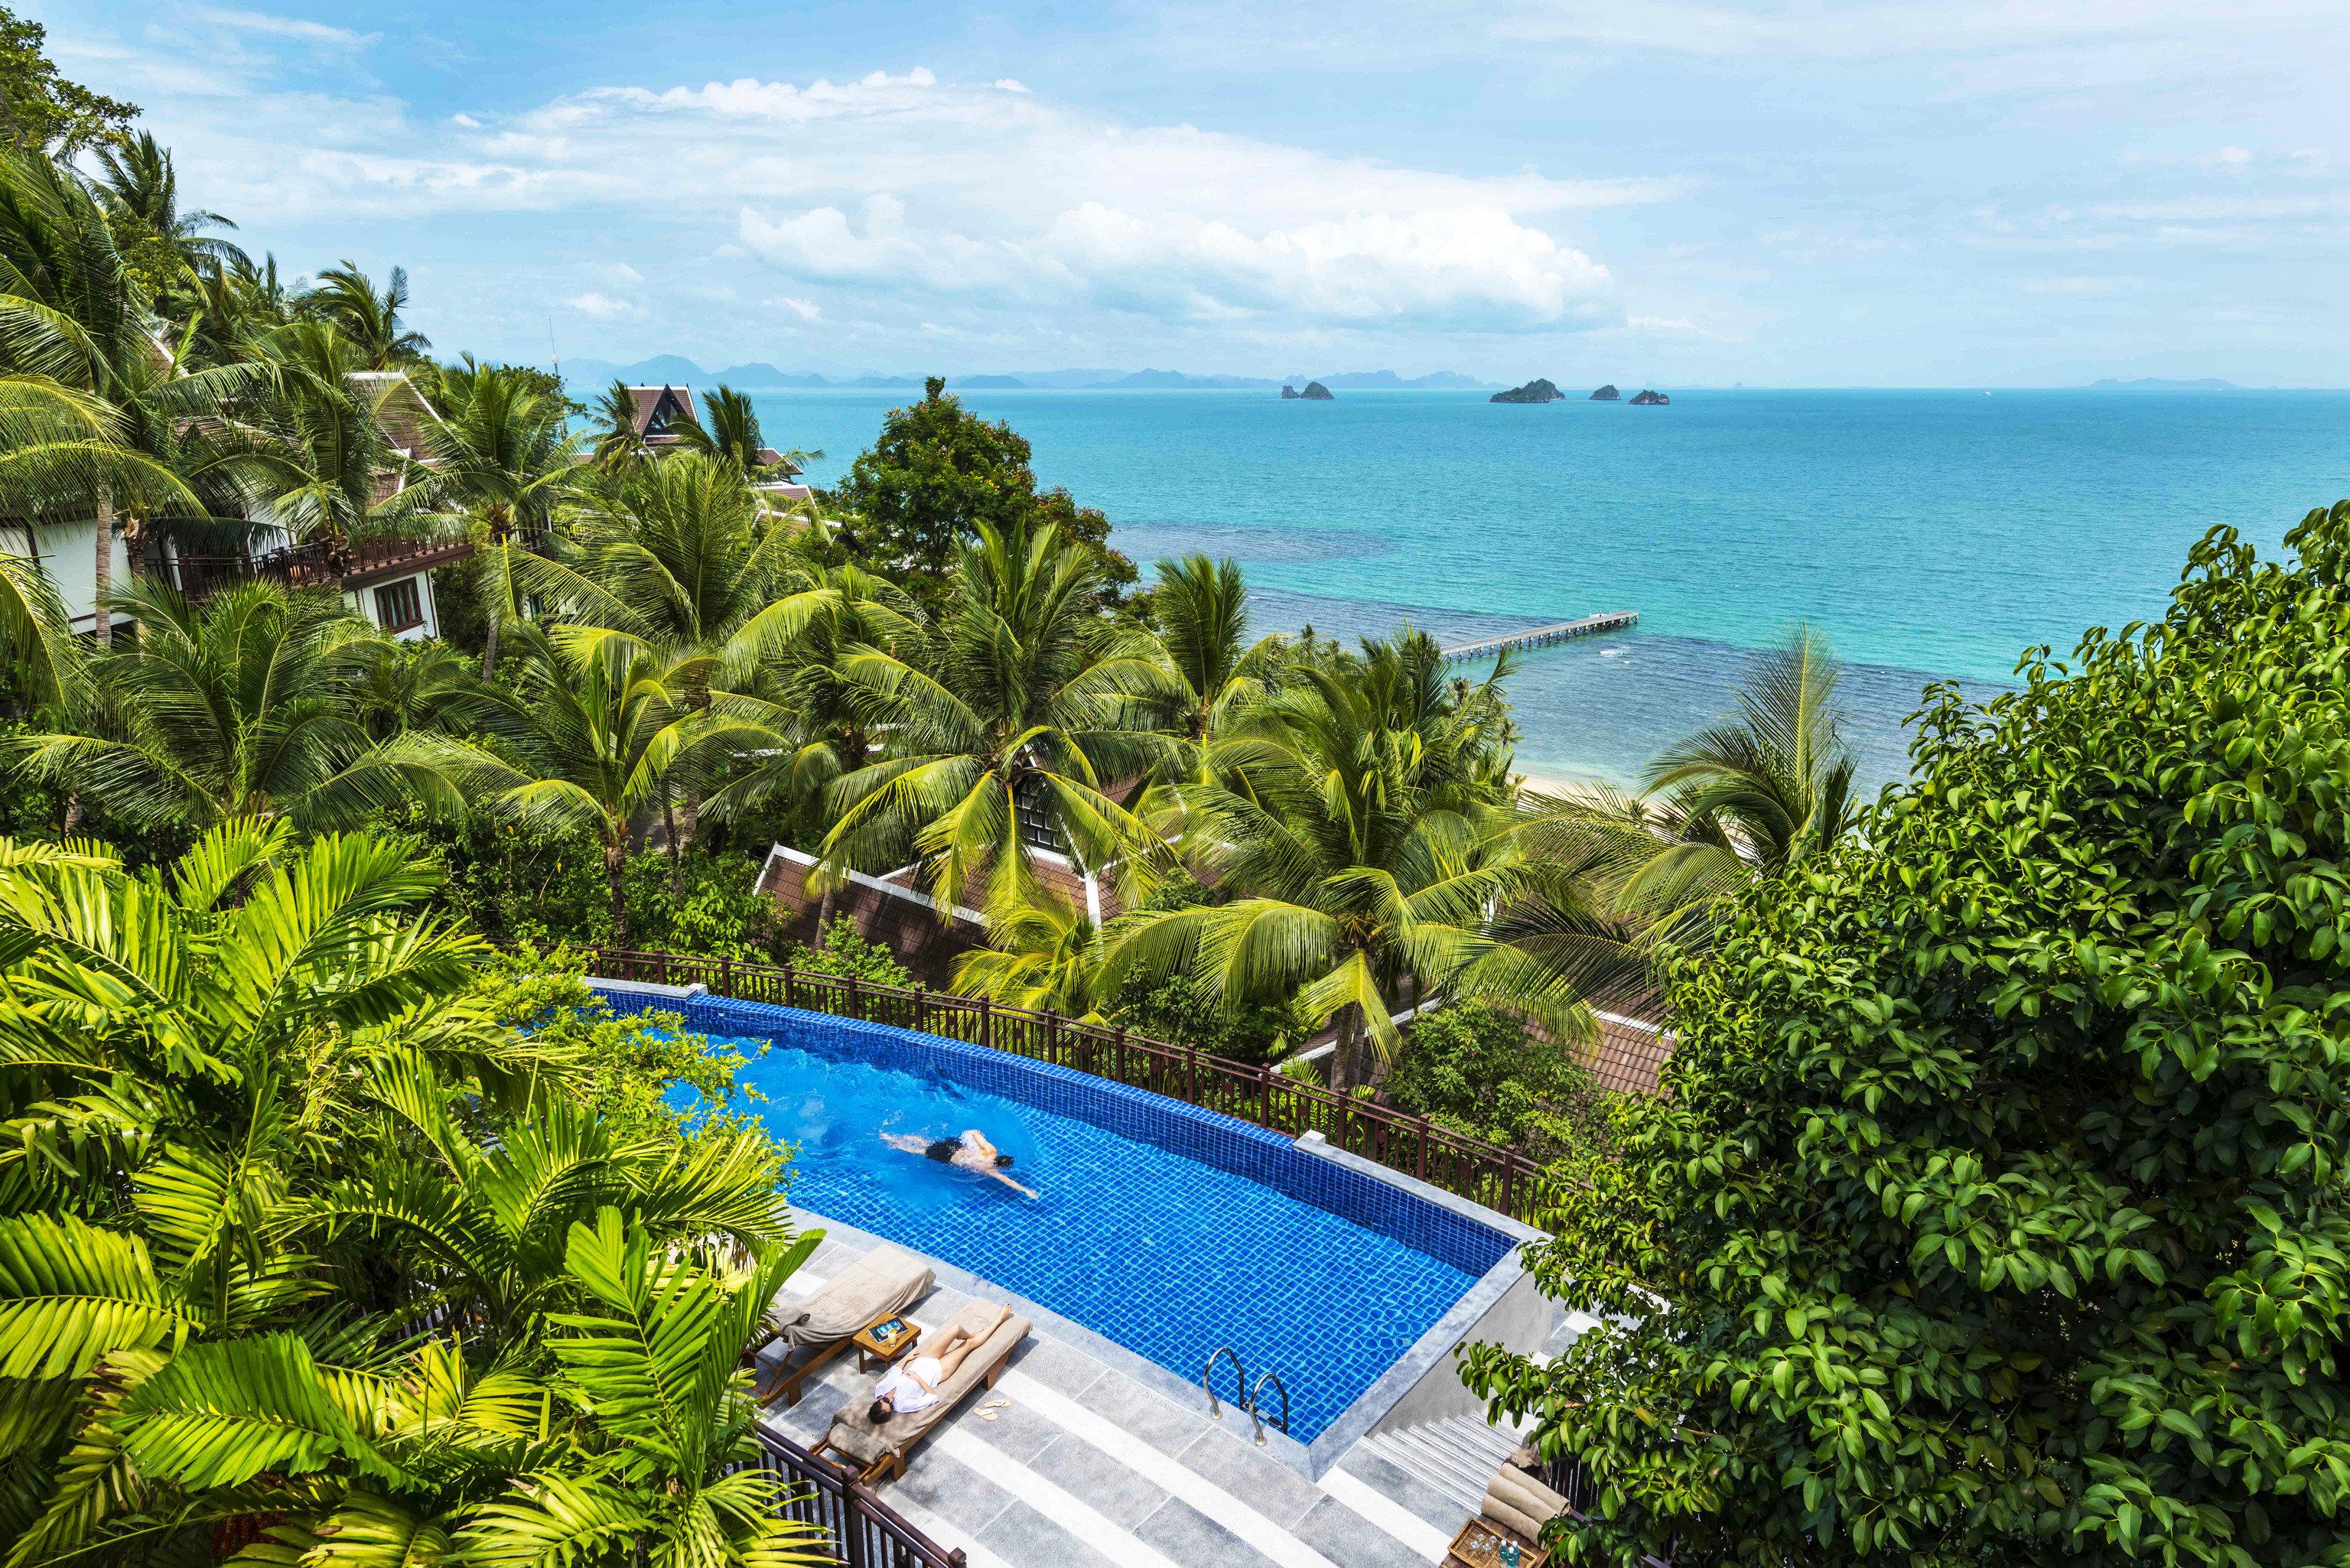 tree water caribbean property Resort tropics Sea Beach Coast Ocean swimming pool Villa Lagoon Island Jungle arecales blue plant overlooking